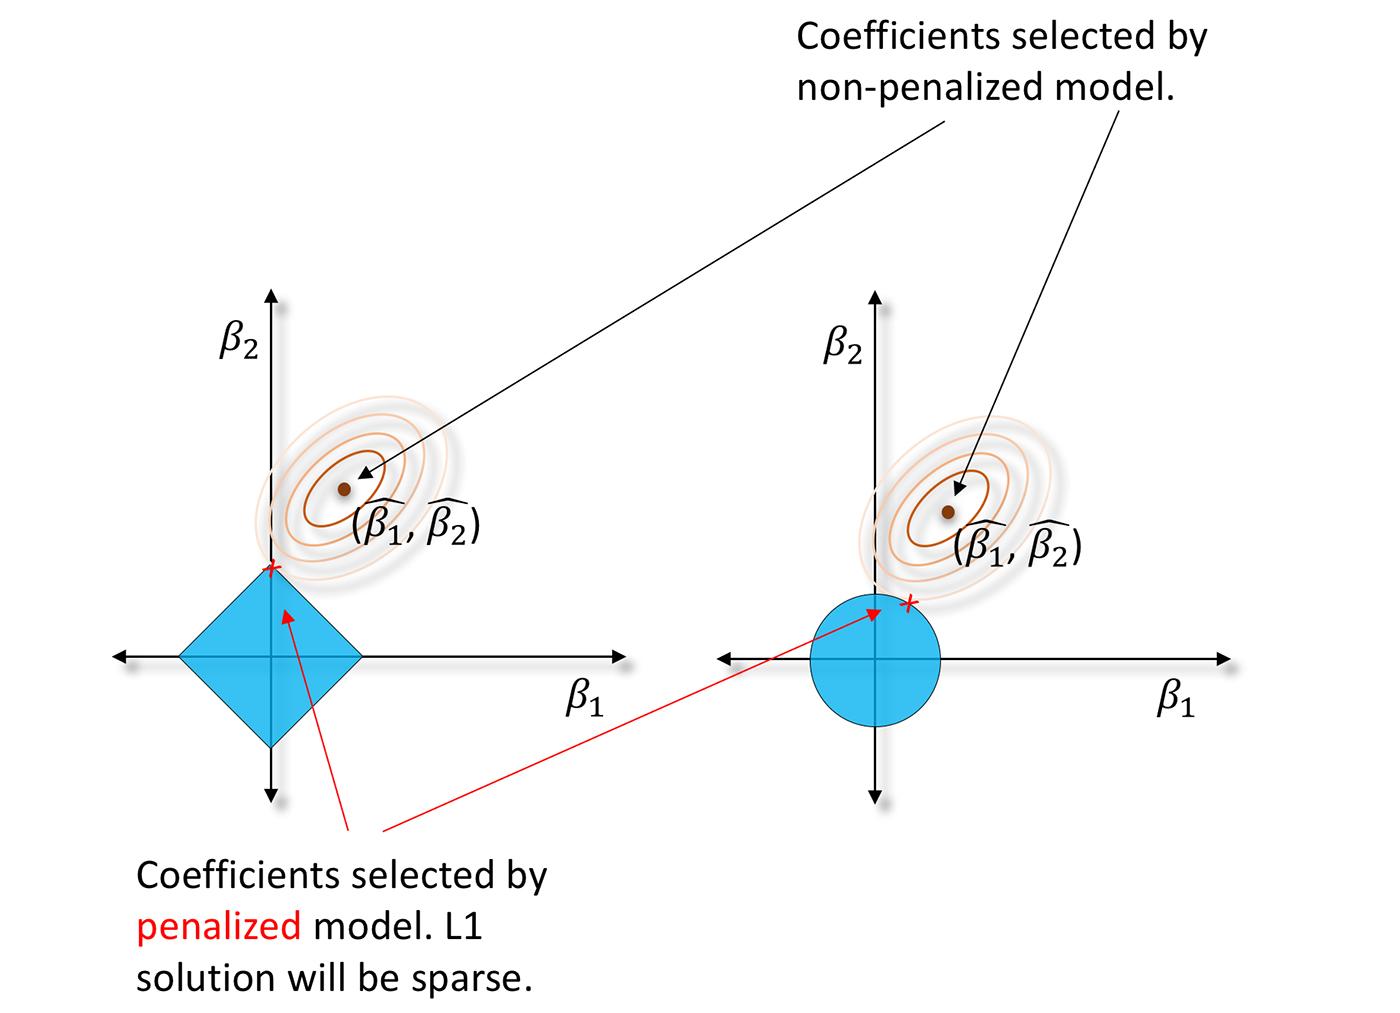 Shrunken feasible regions for L1/LASSO penalized regression parameters (left) and L2/ridge penalized regression parameters (right)